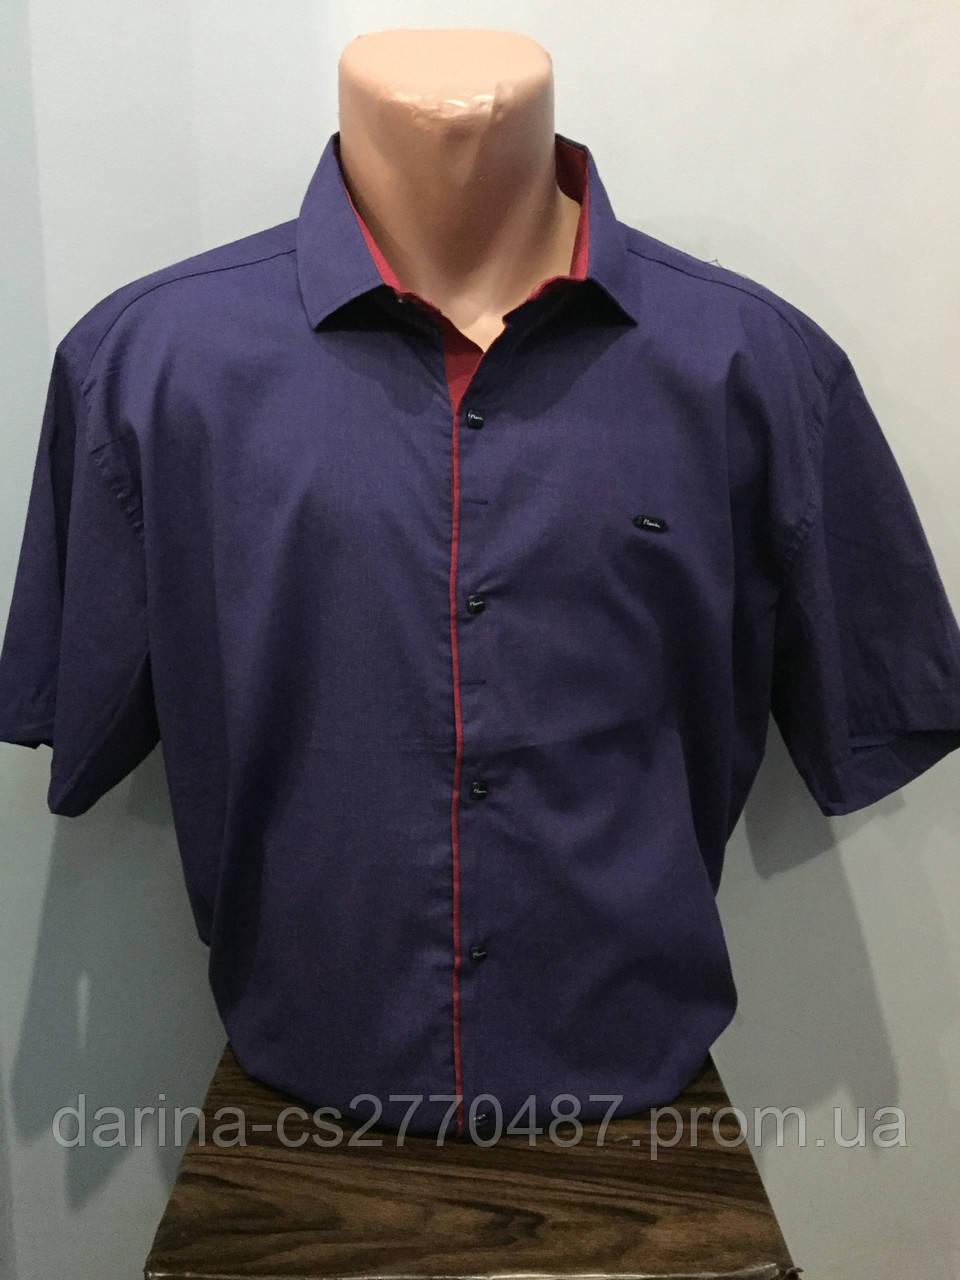 Мужская рубашка батал на кнопках 3XL-6XL